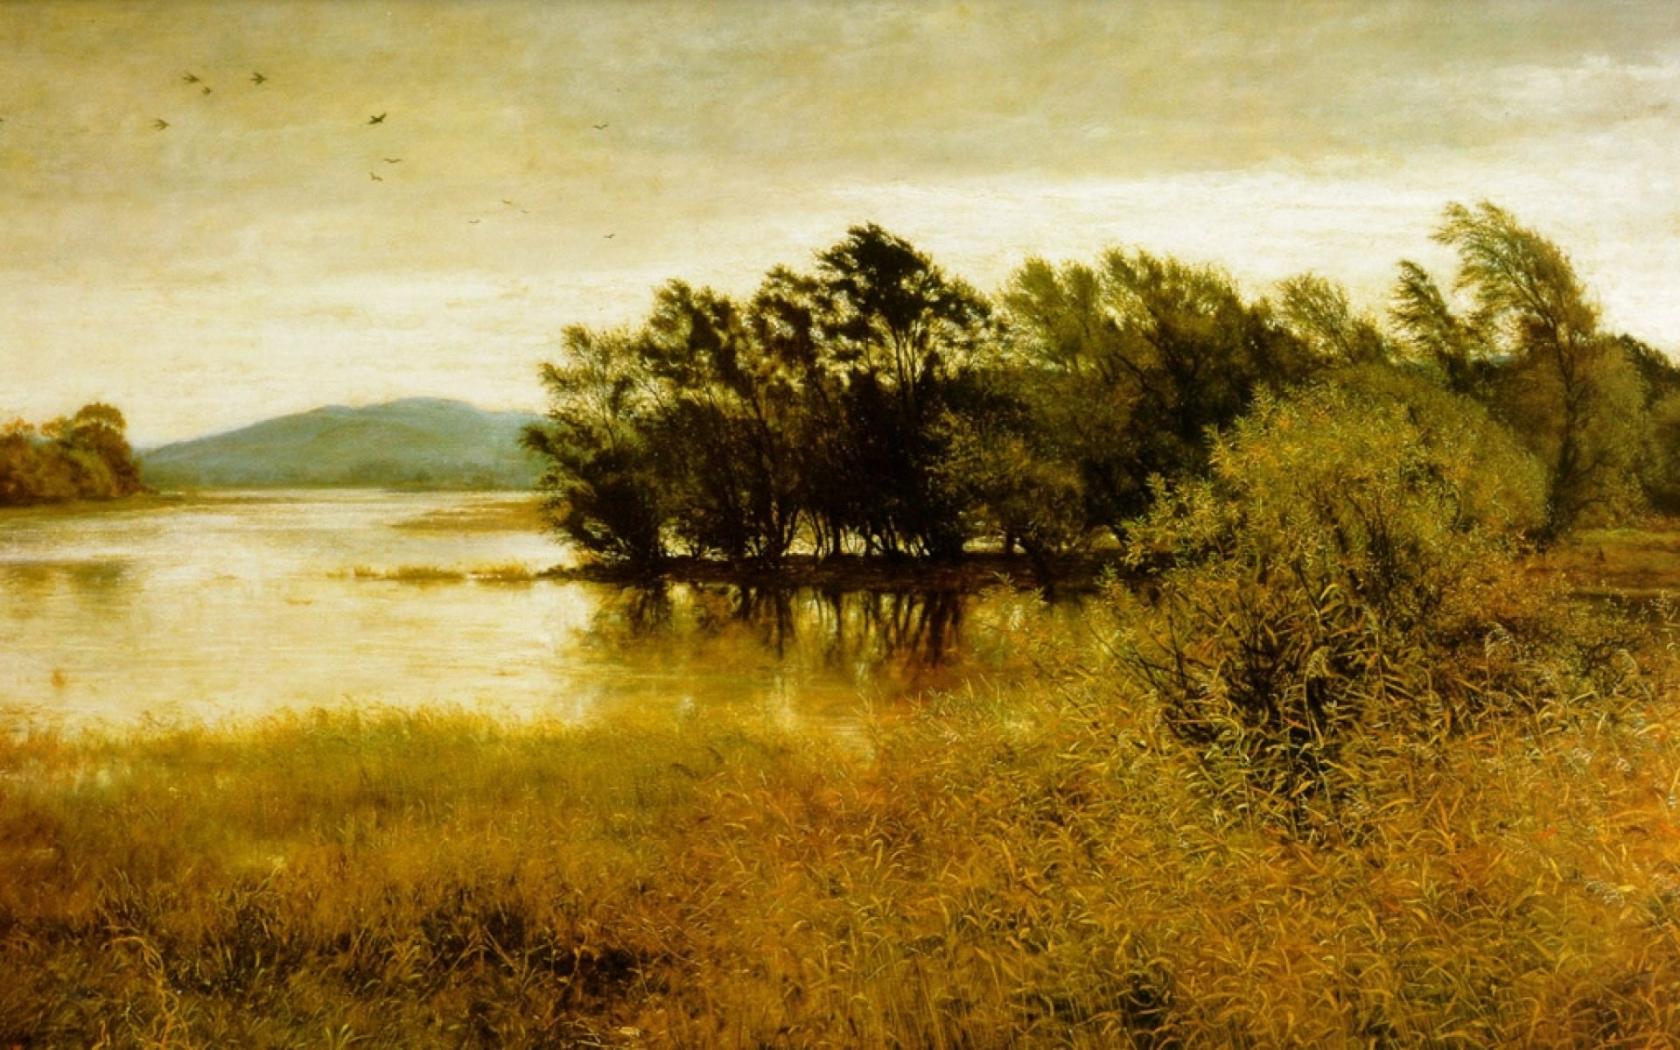 Impressionist painting 1680x1050 Wallpapers 1680x1050 1680x1050